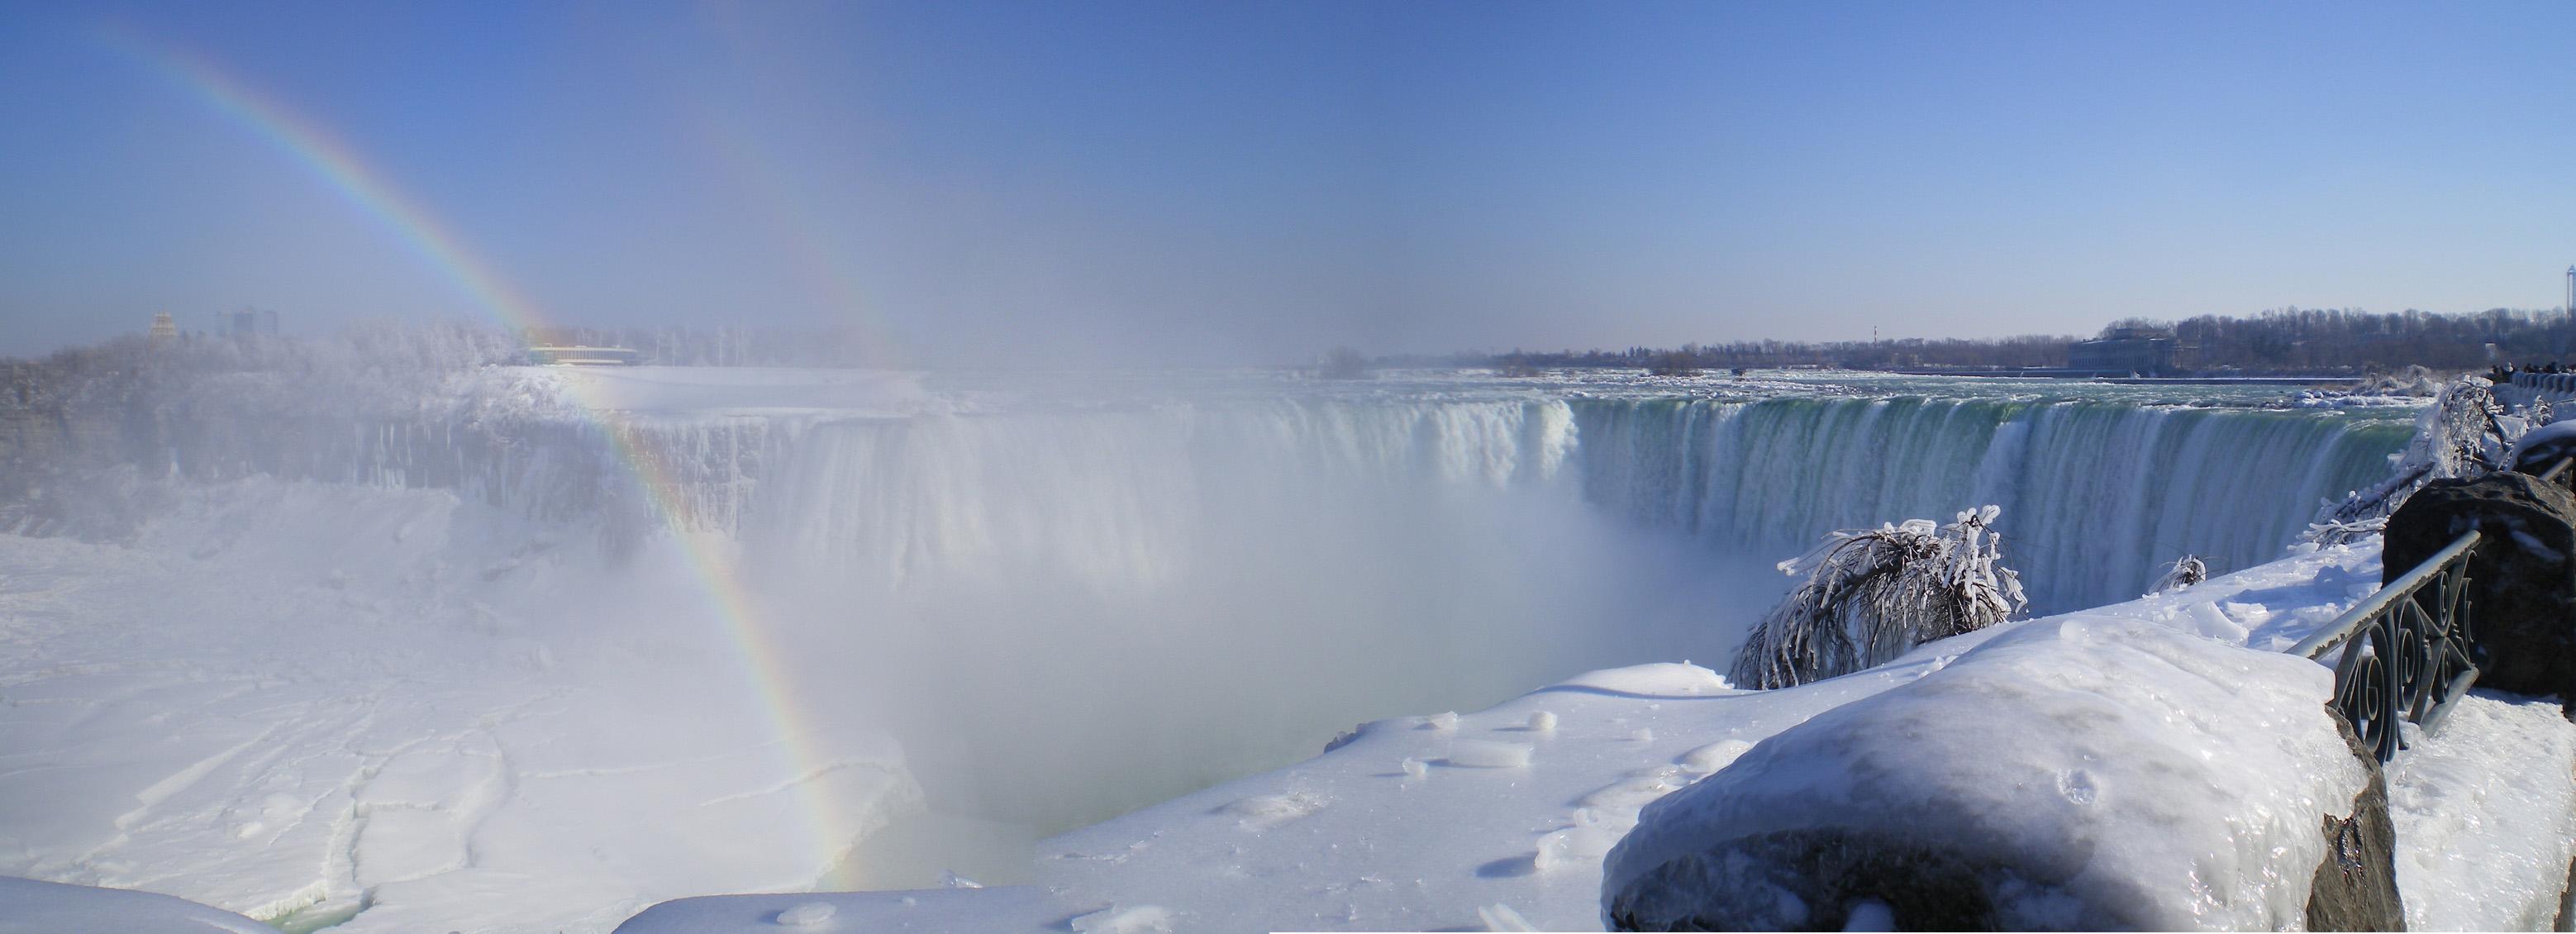 Niagara_Falls_Panorama2